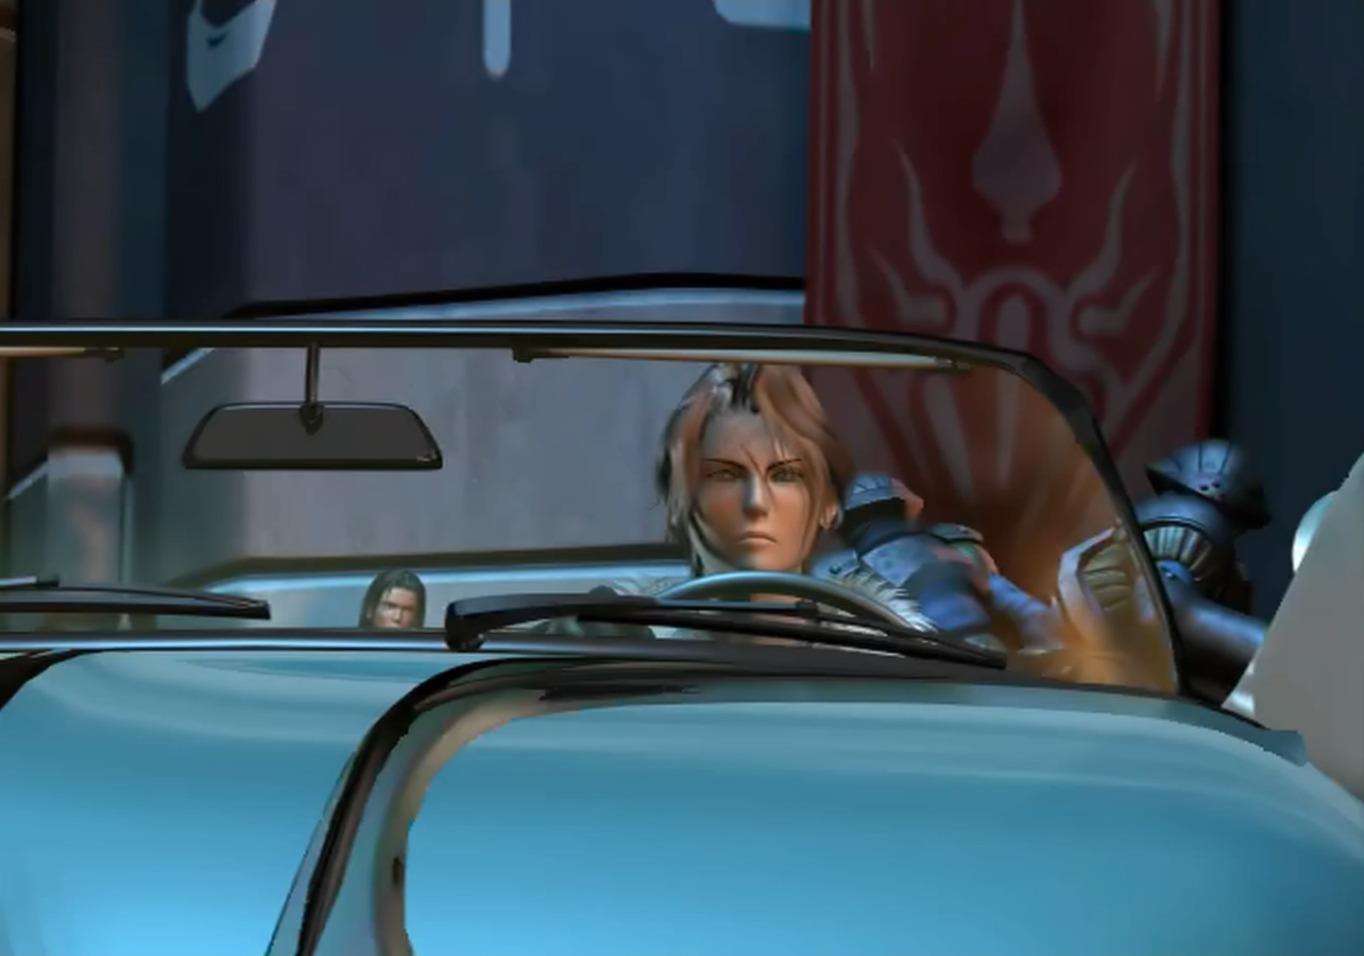 Tempest (Final Fantasy VIII)